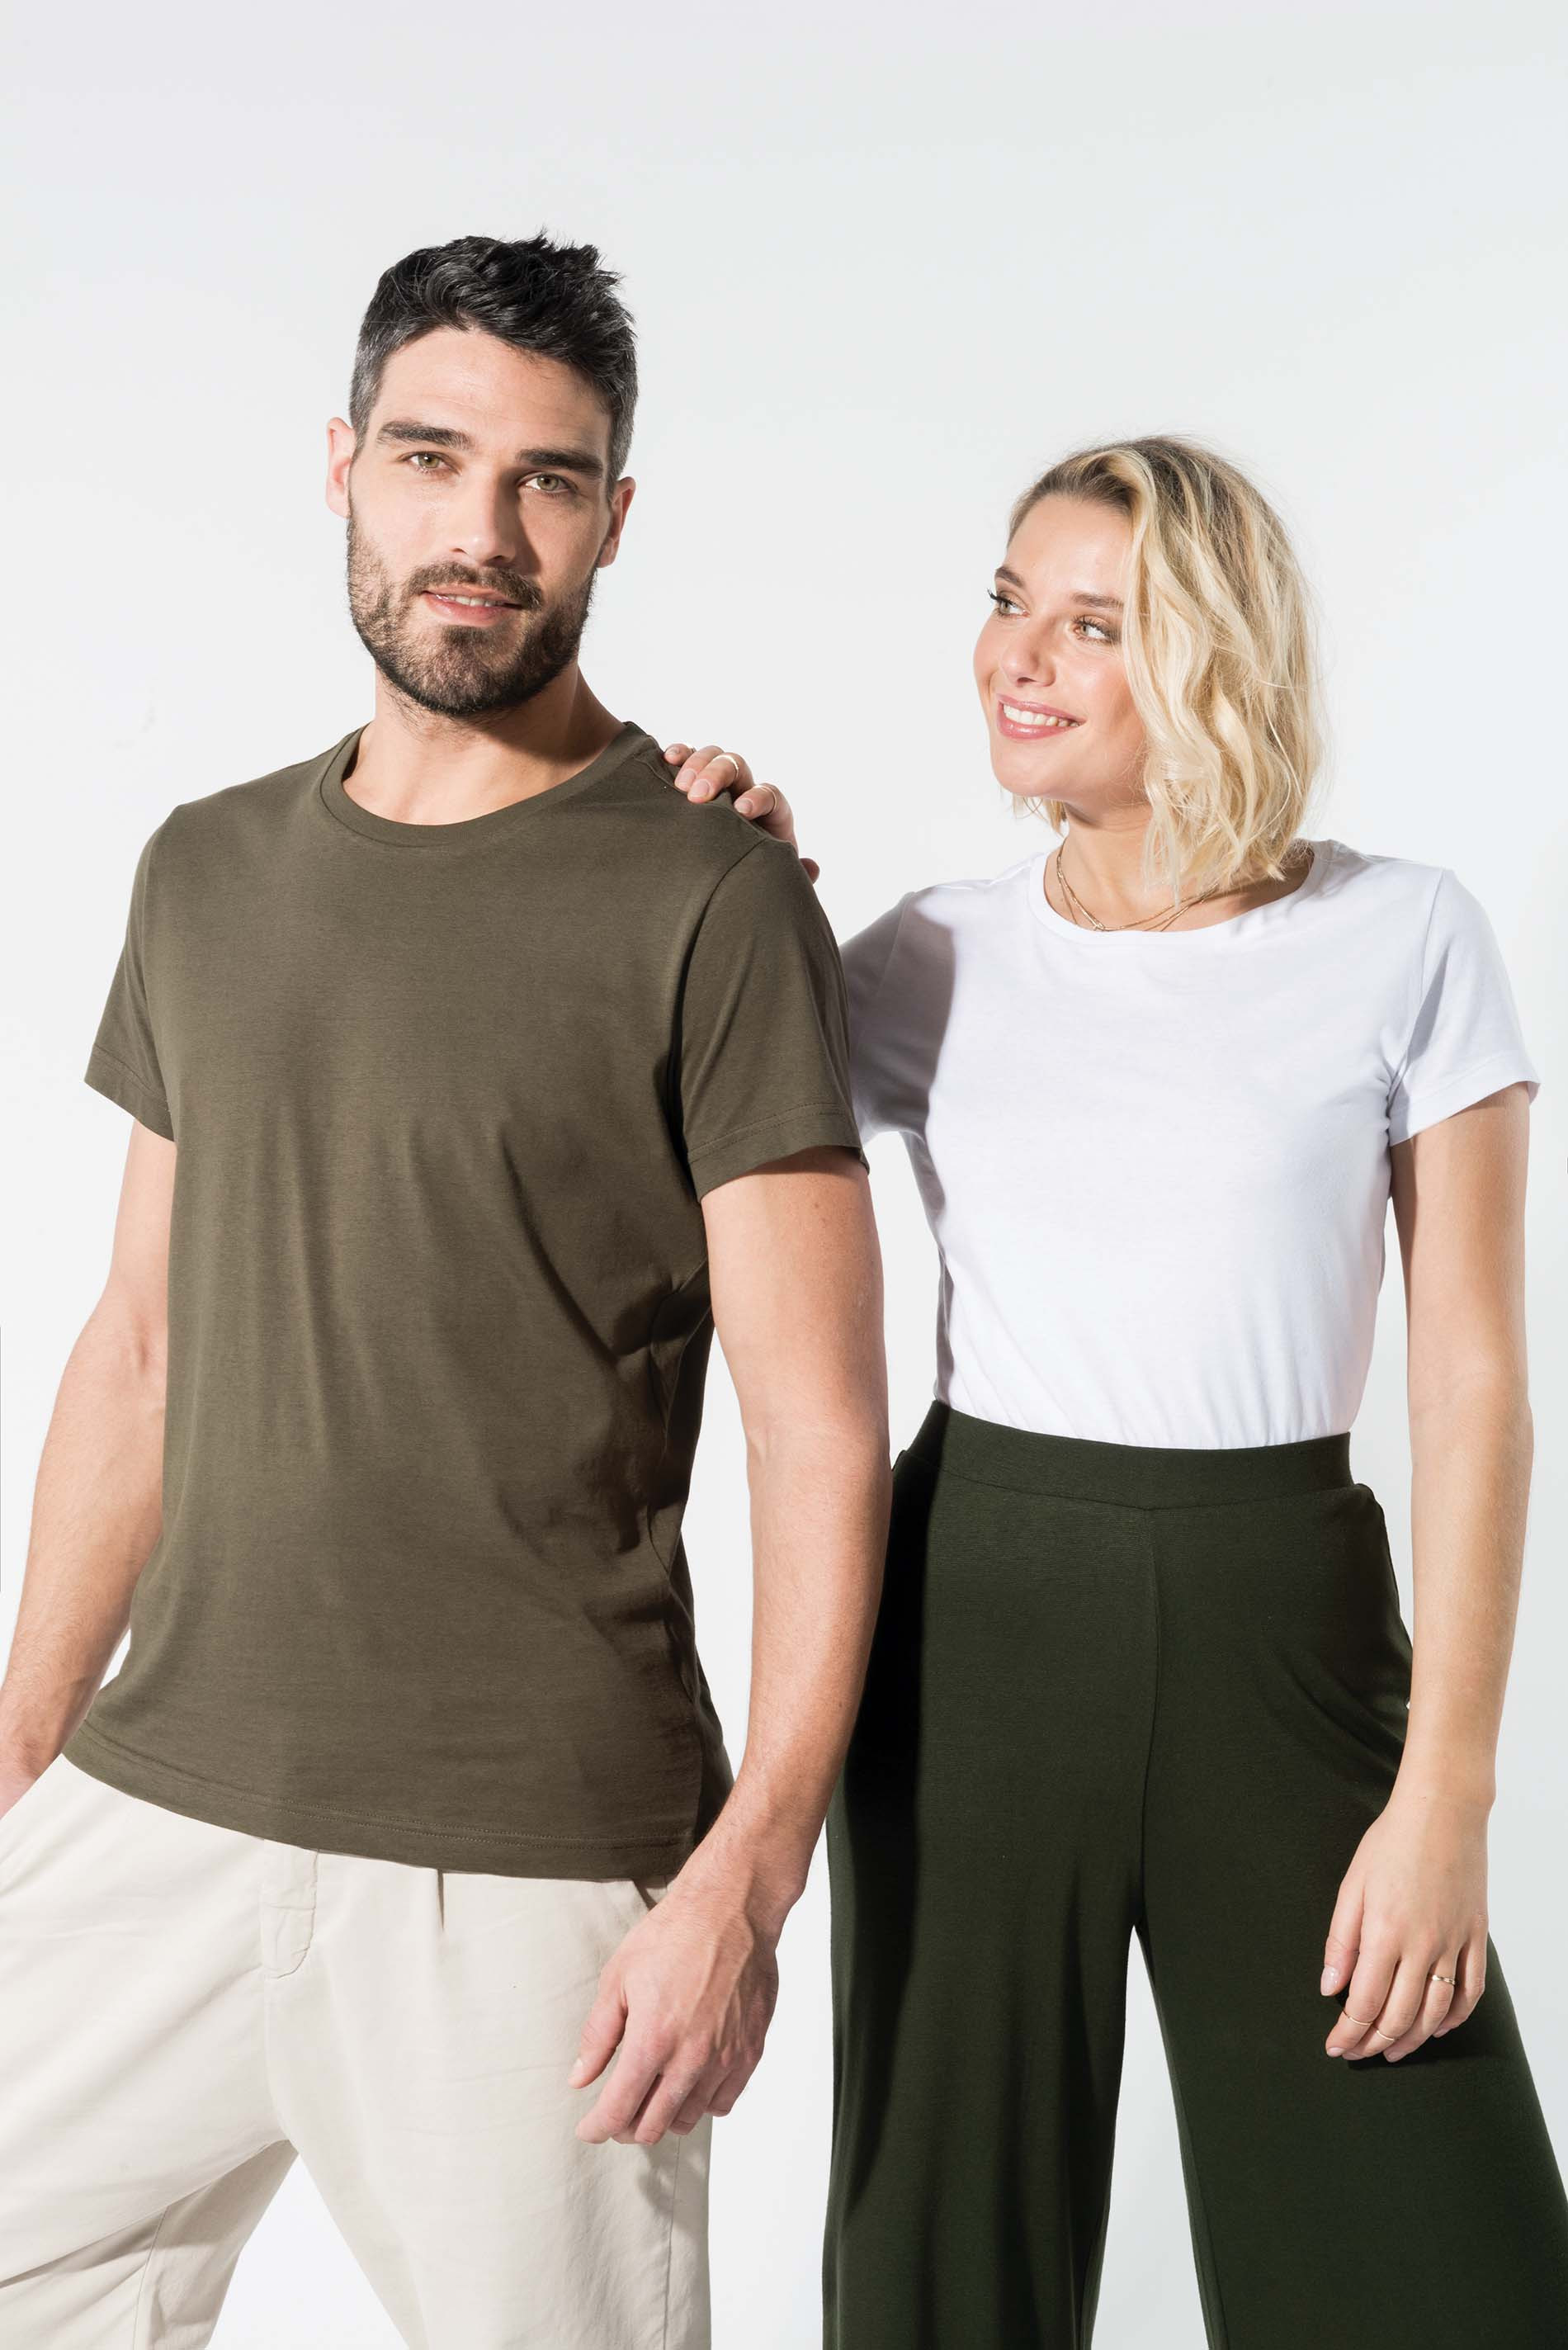 T-shirt coton BIO - marque KARIBAN